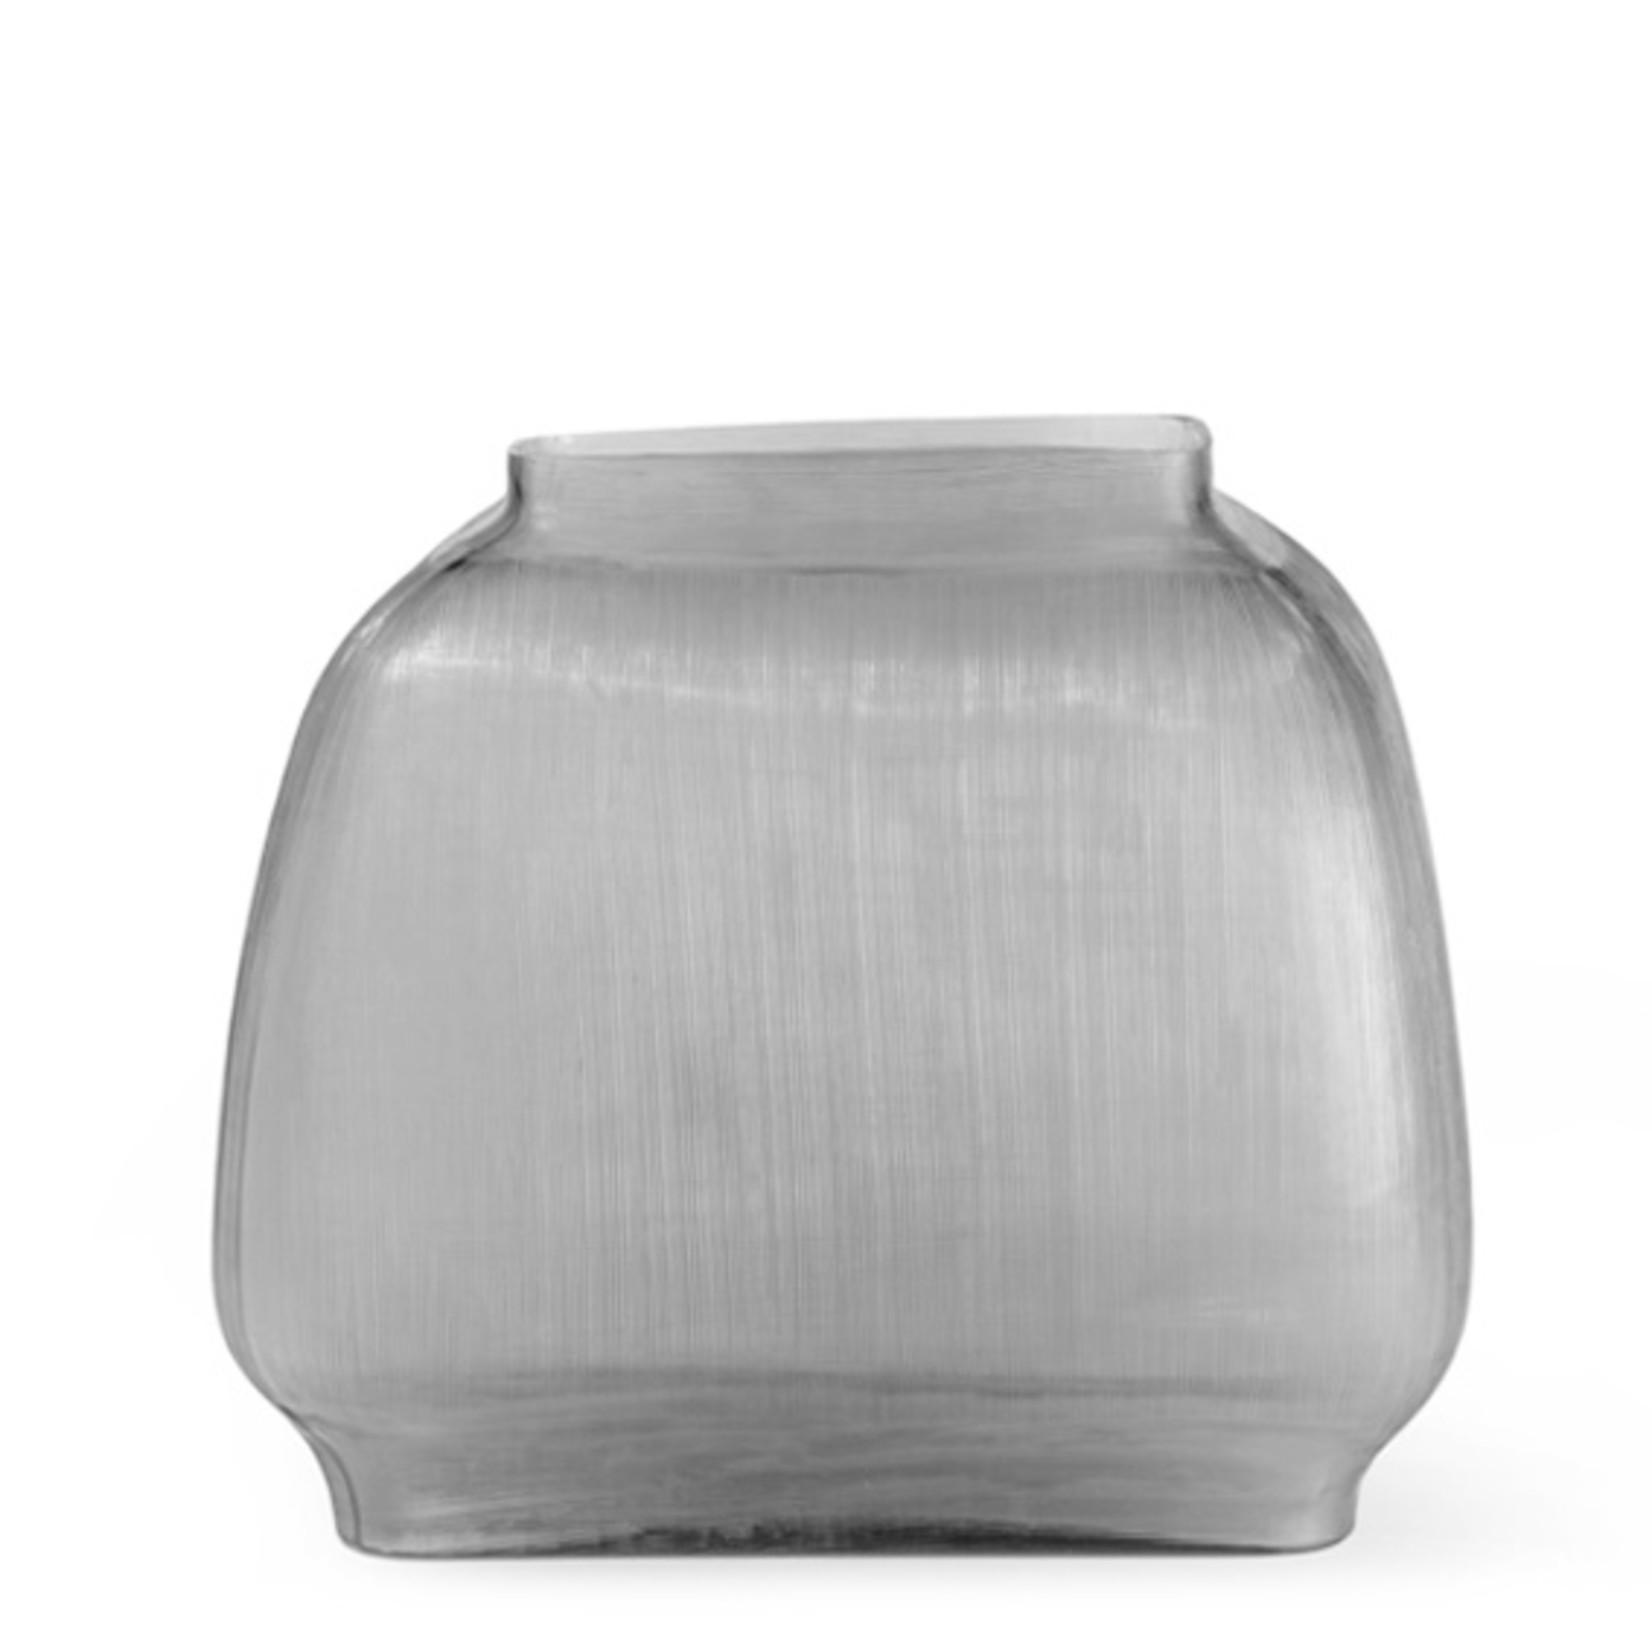 Guaxs Vase Mythos L   Grey